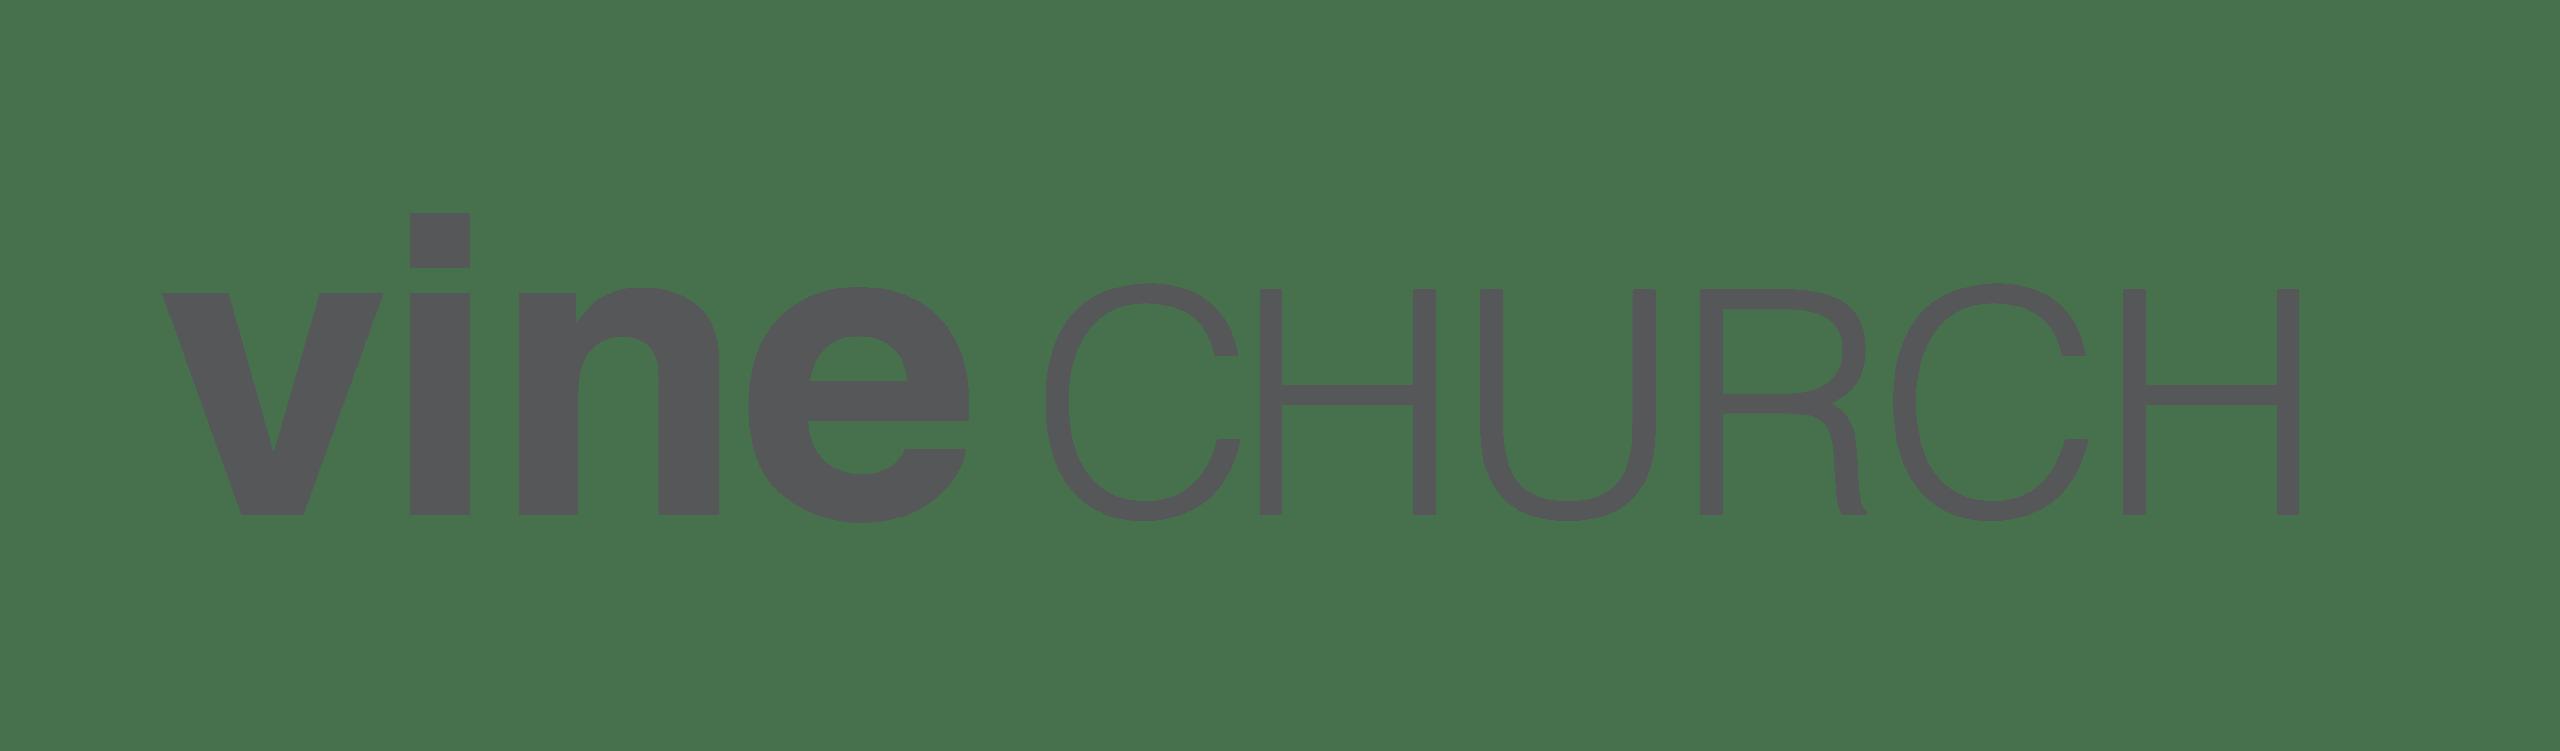 Vine Church Dunfermline - Vine Church Dunfermline